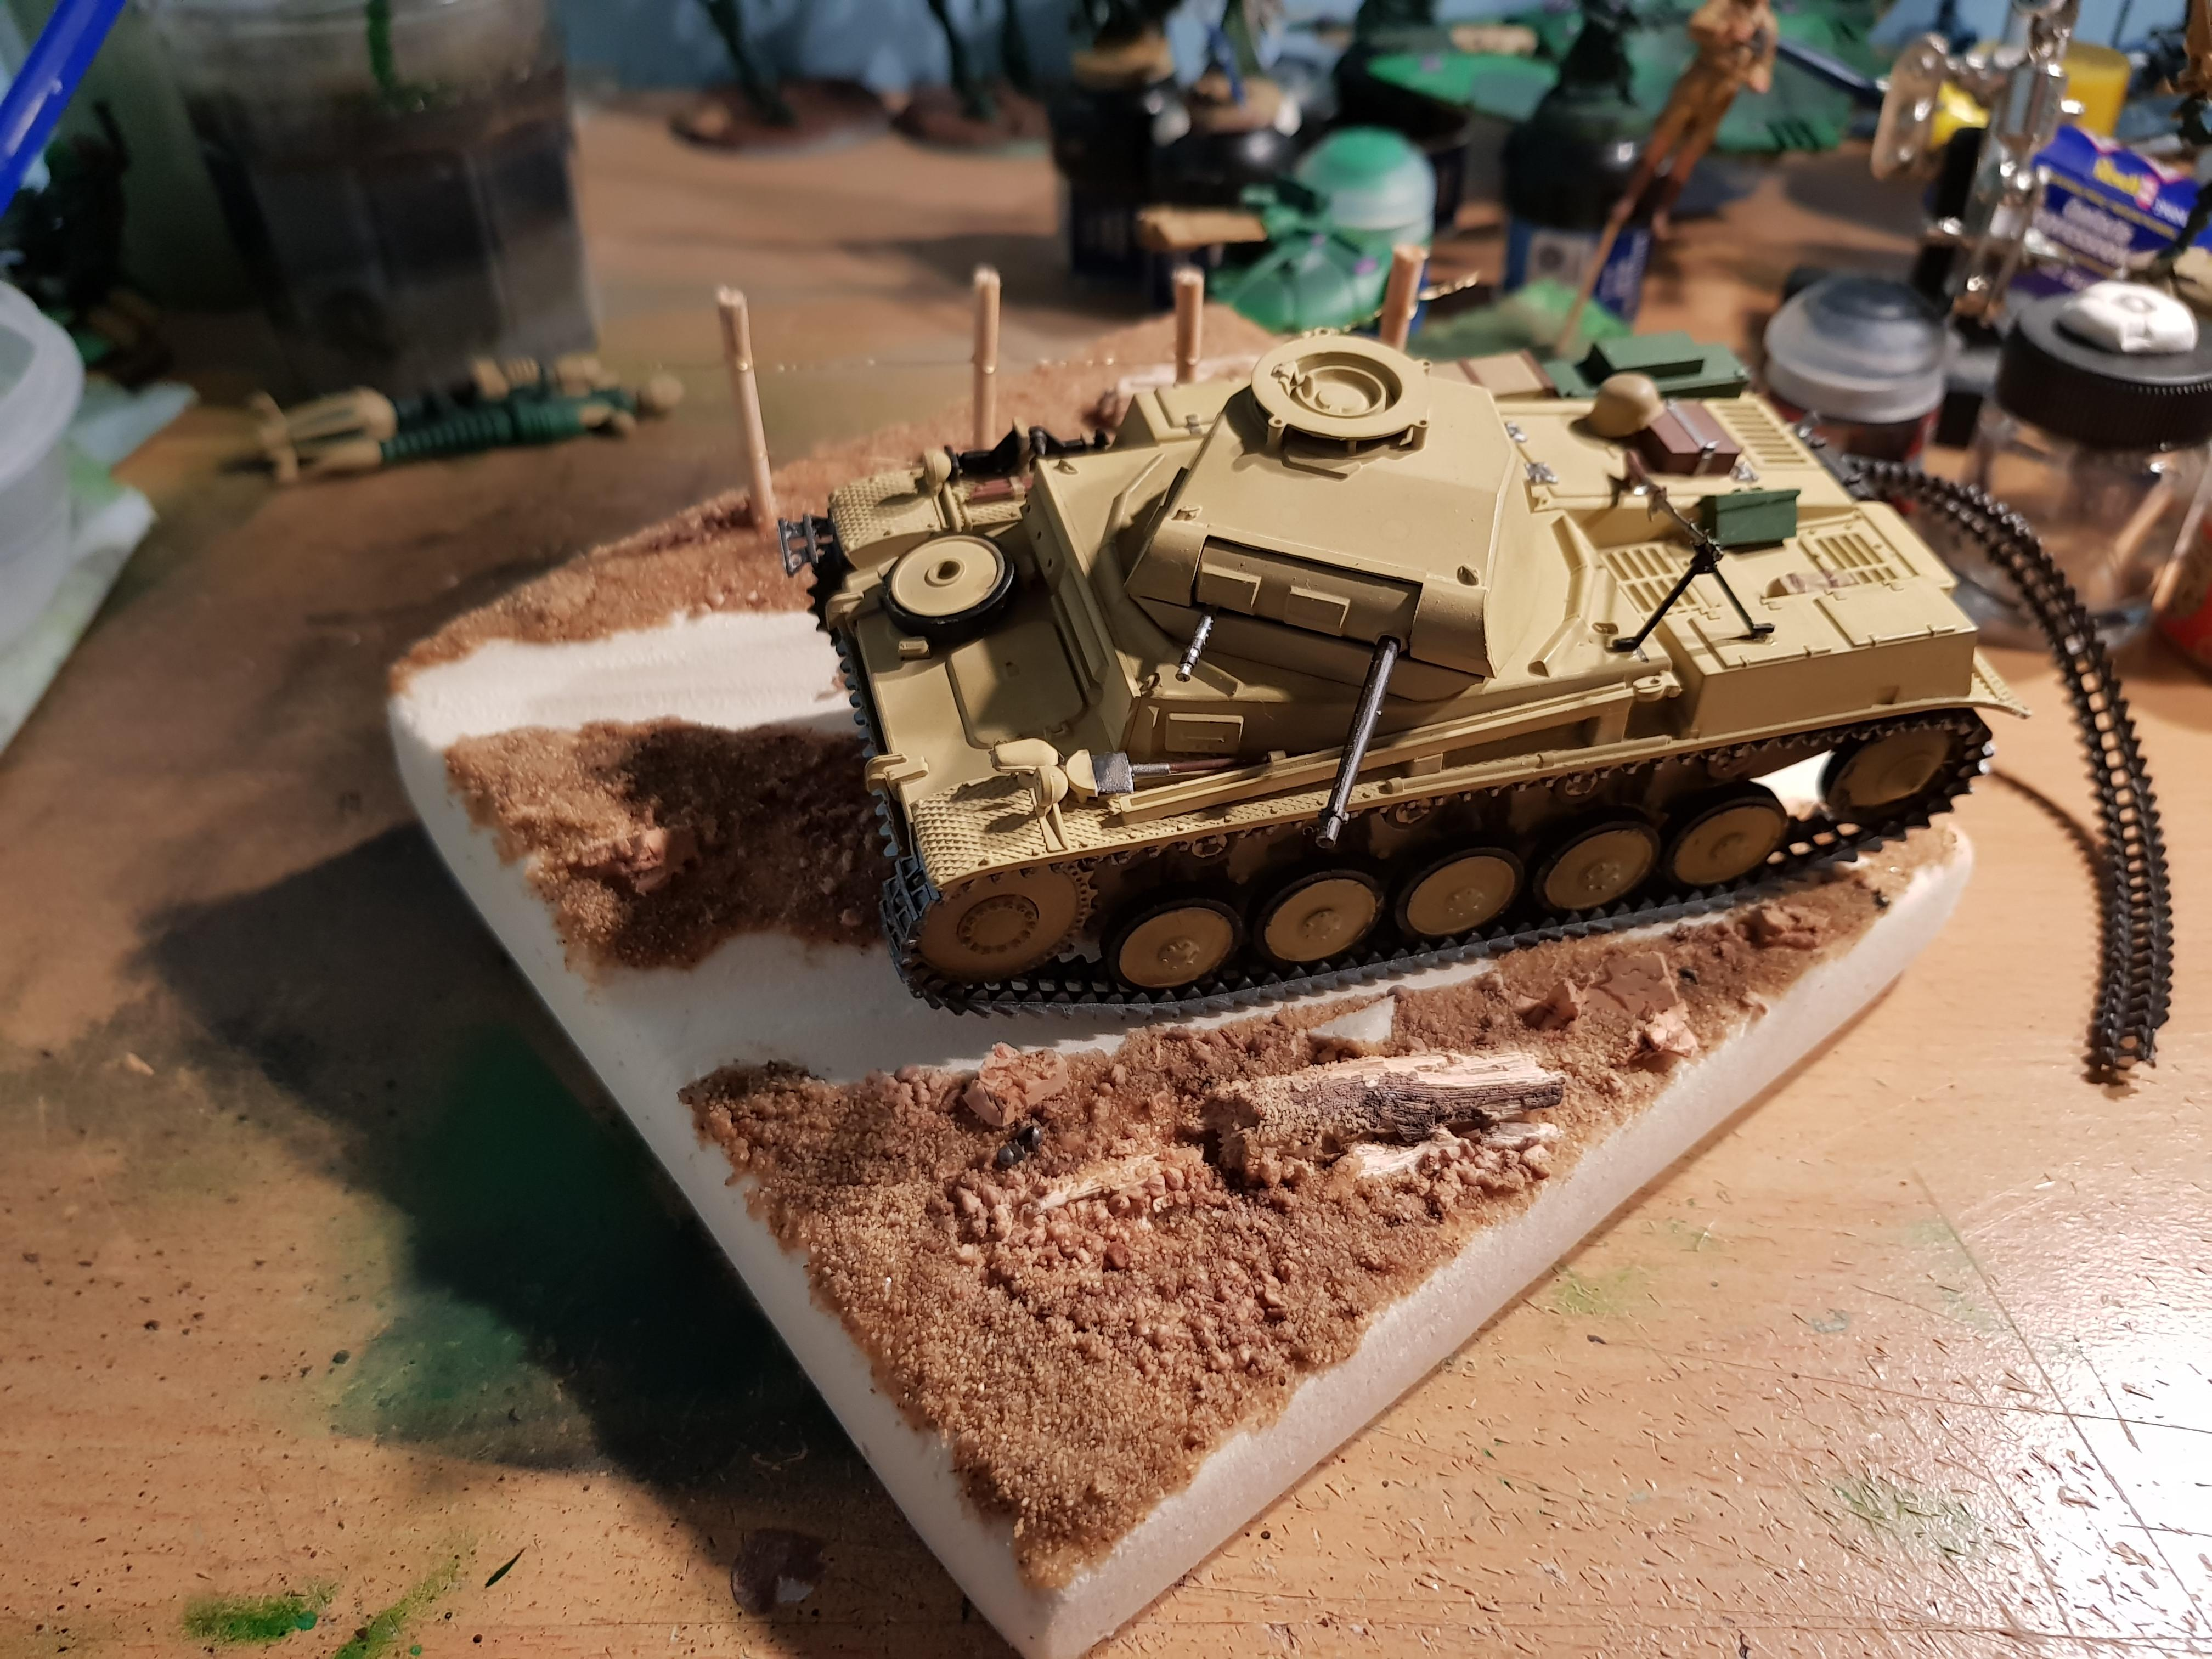 Allies, Axis, Diorama, Germans, Modern Warfare, Panzer, Scale Model, Tank, World War, World War 2